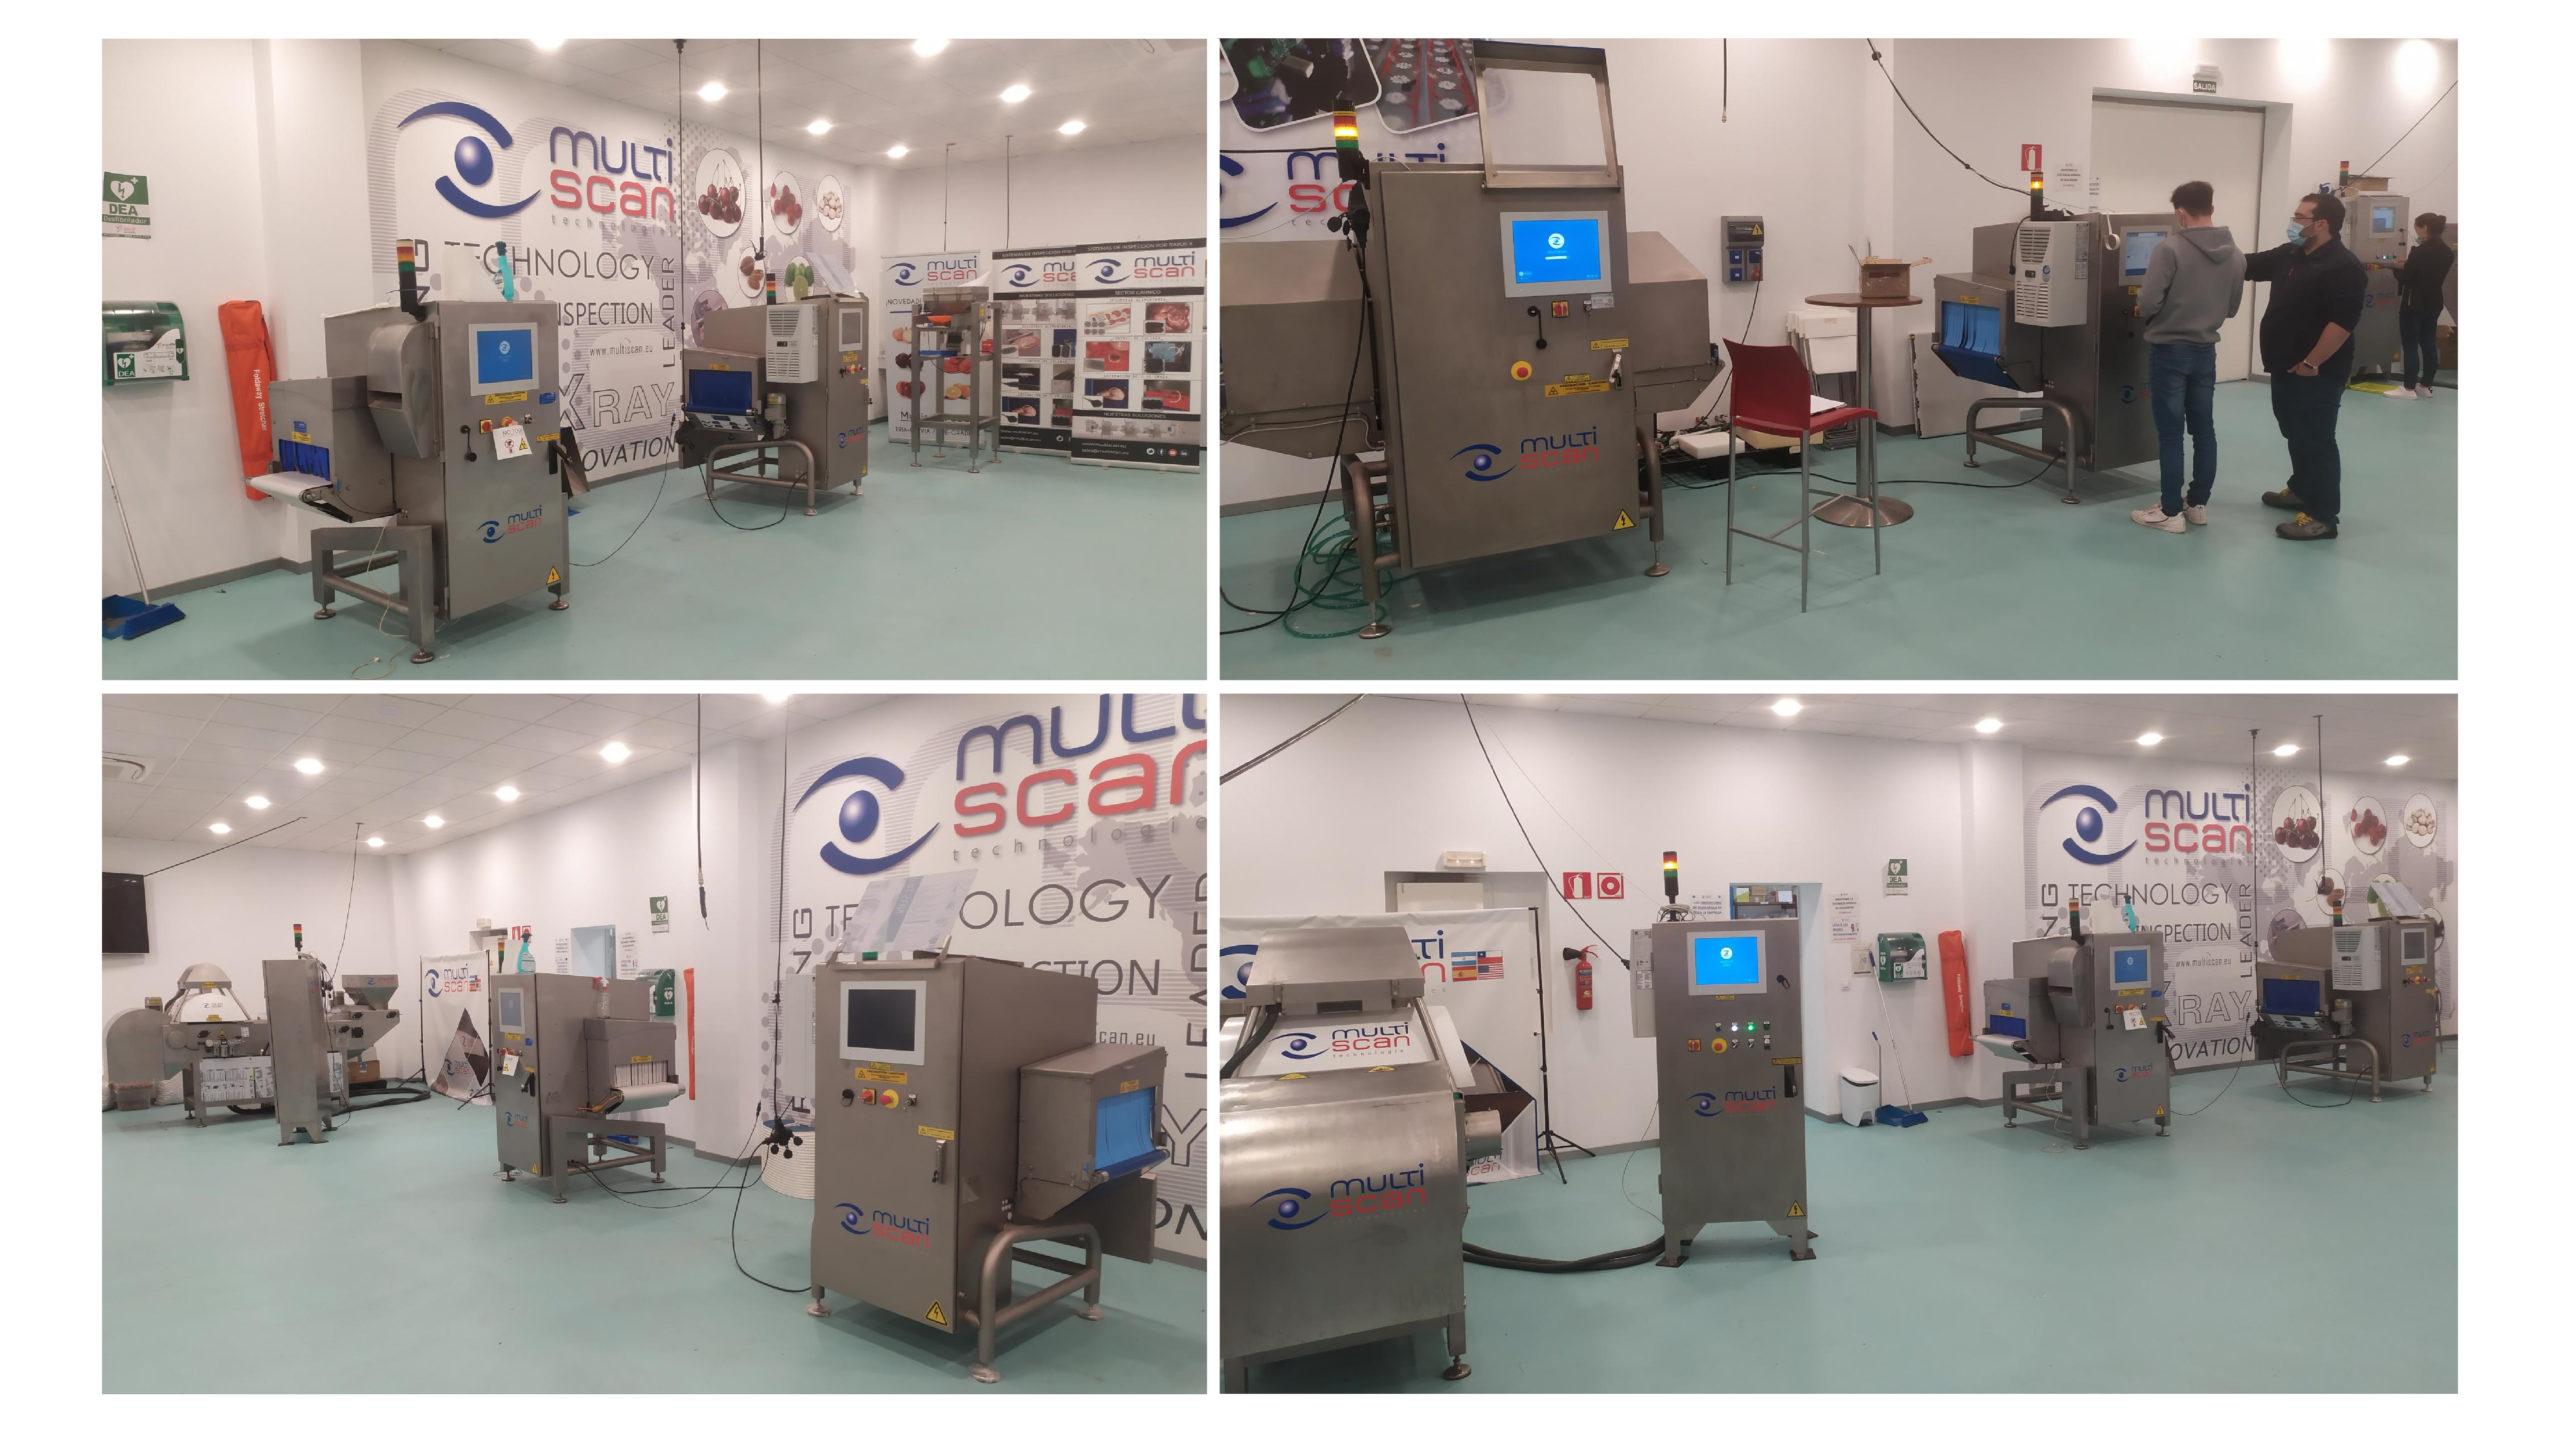 Multiscan showroom for testing